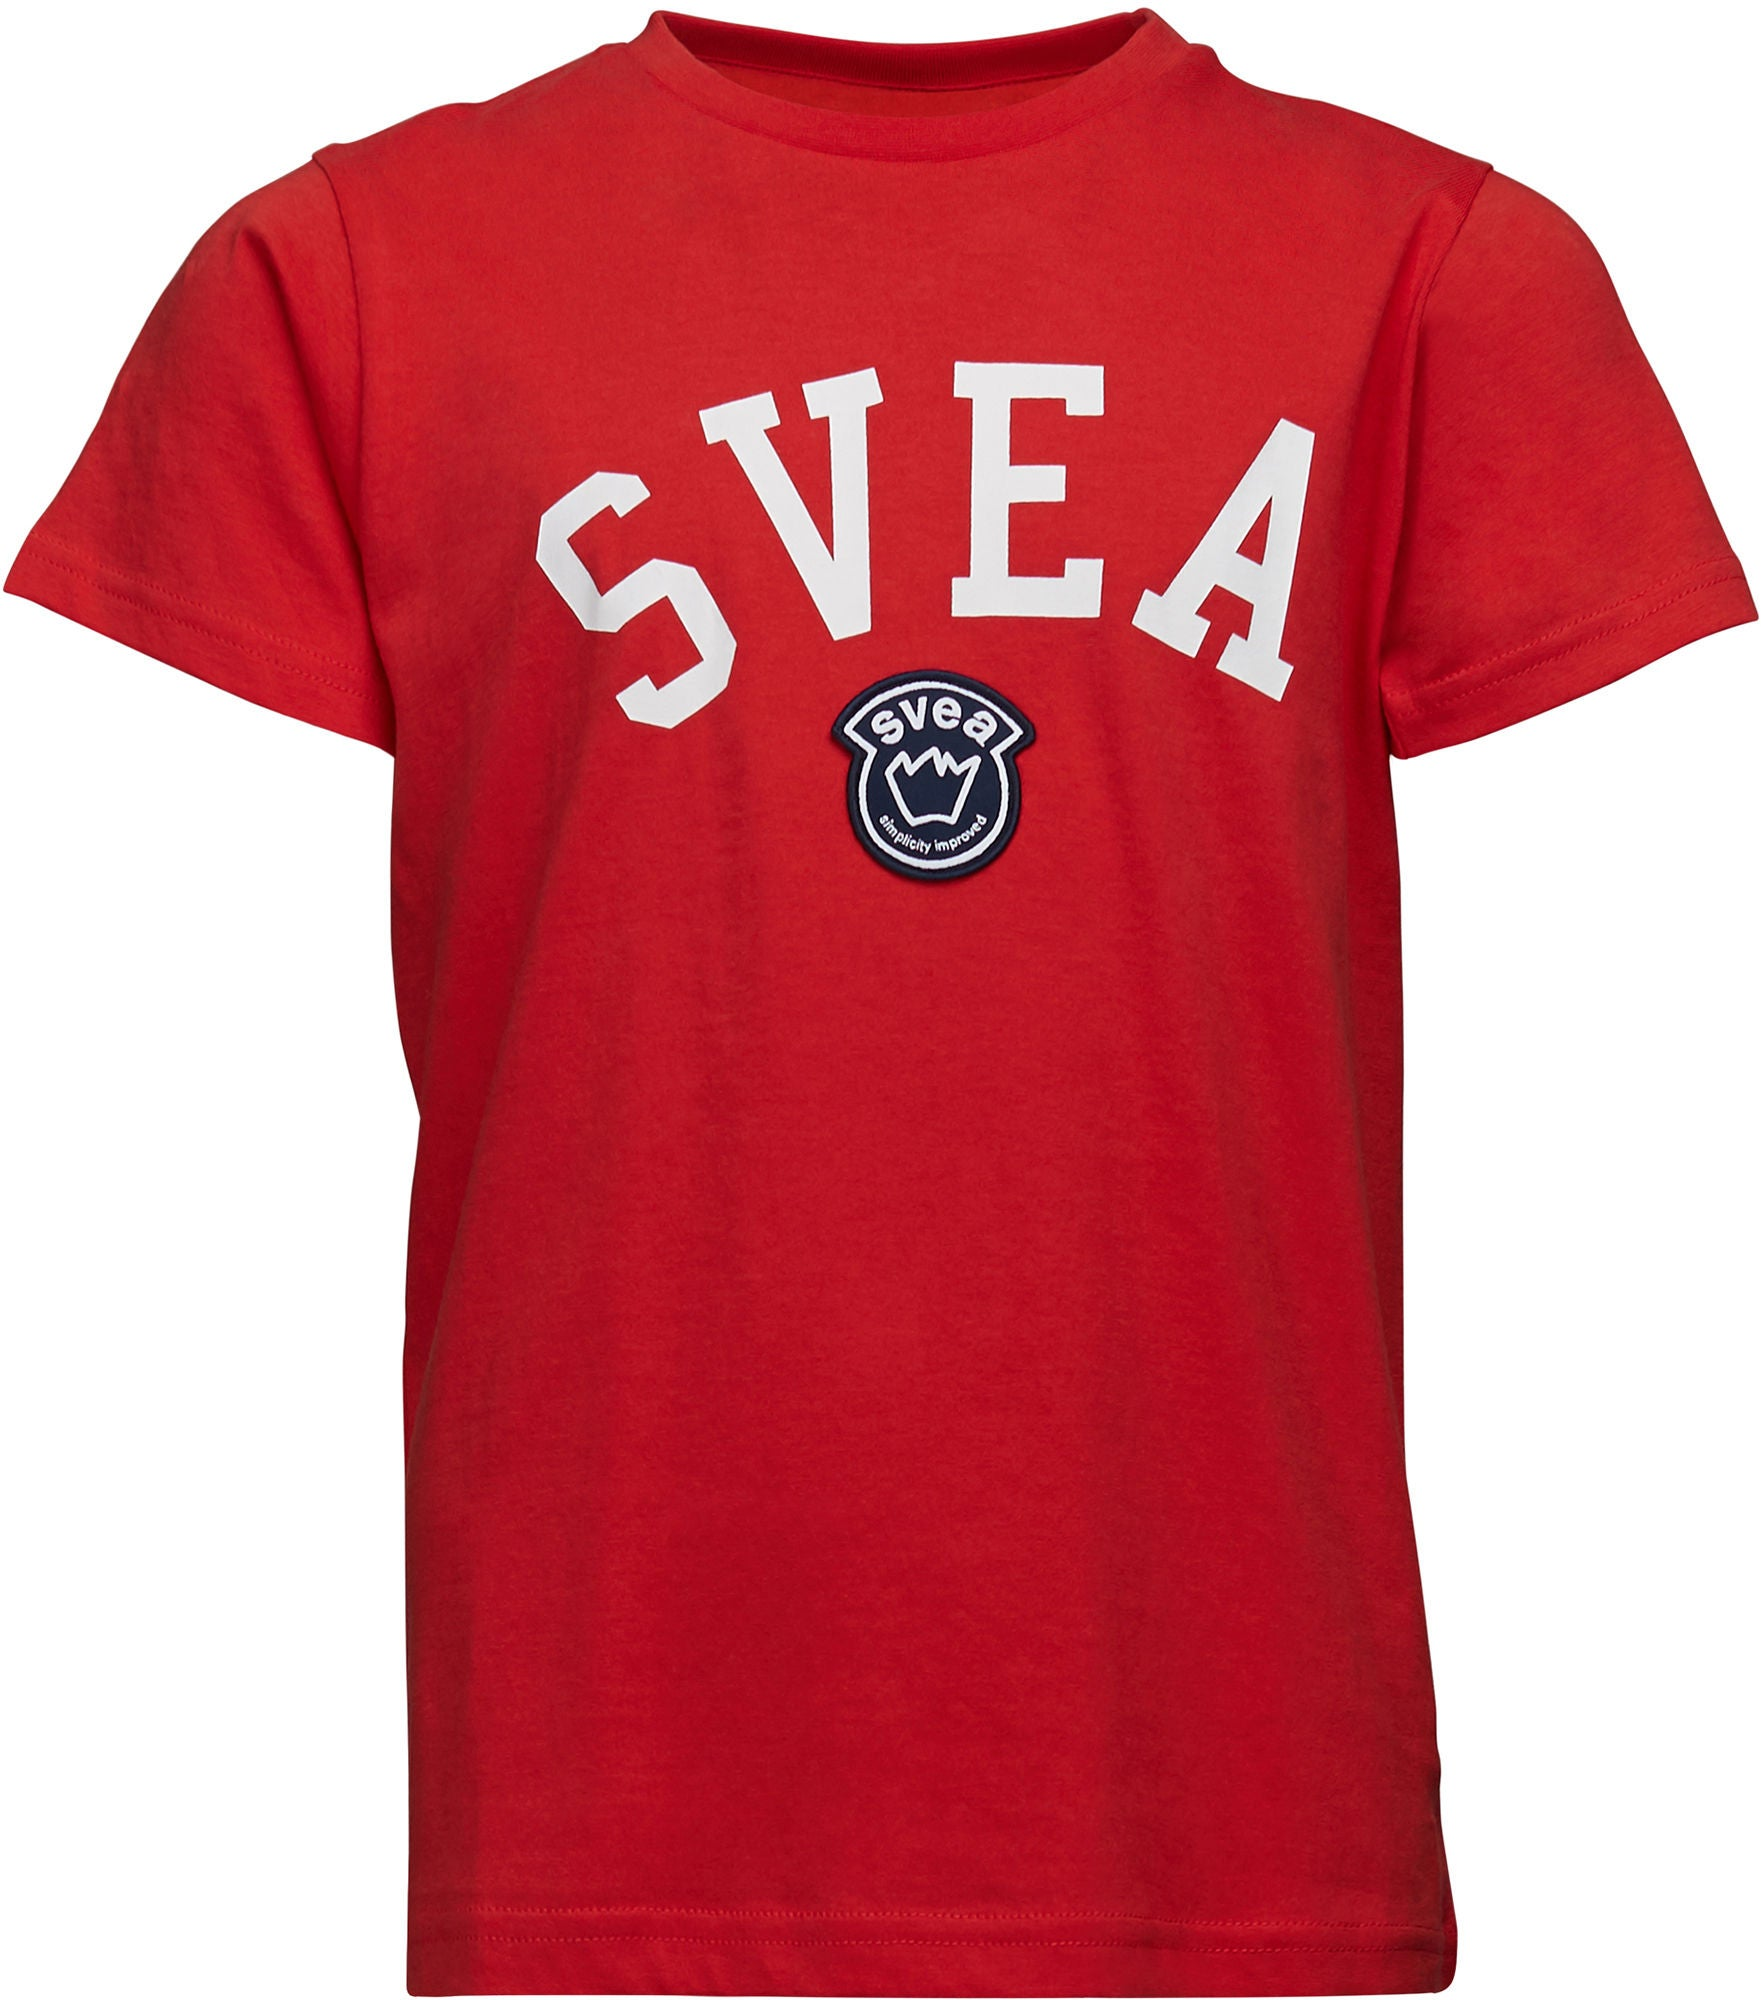 Svea Chicago T-Shirt, Röd 170